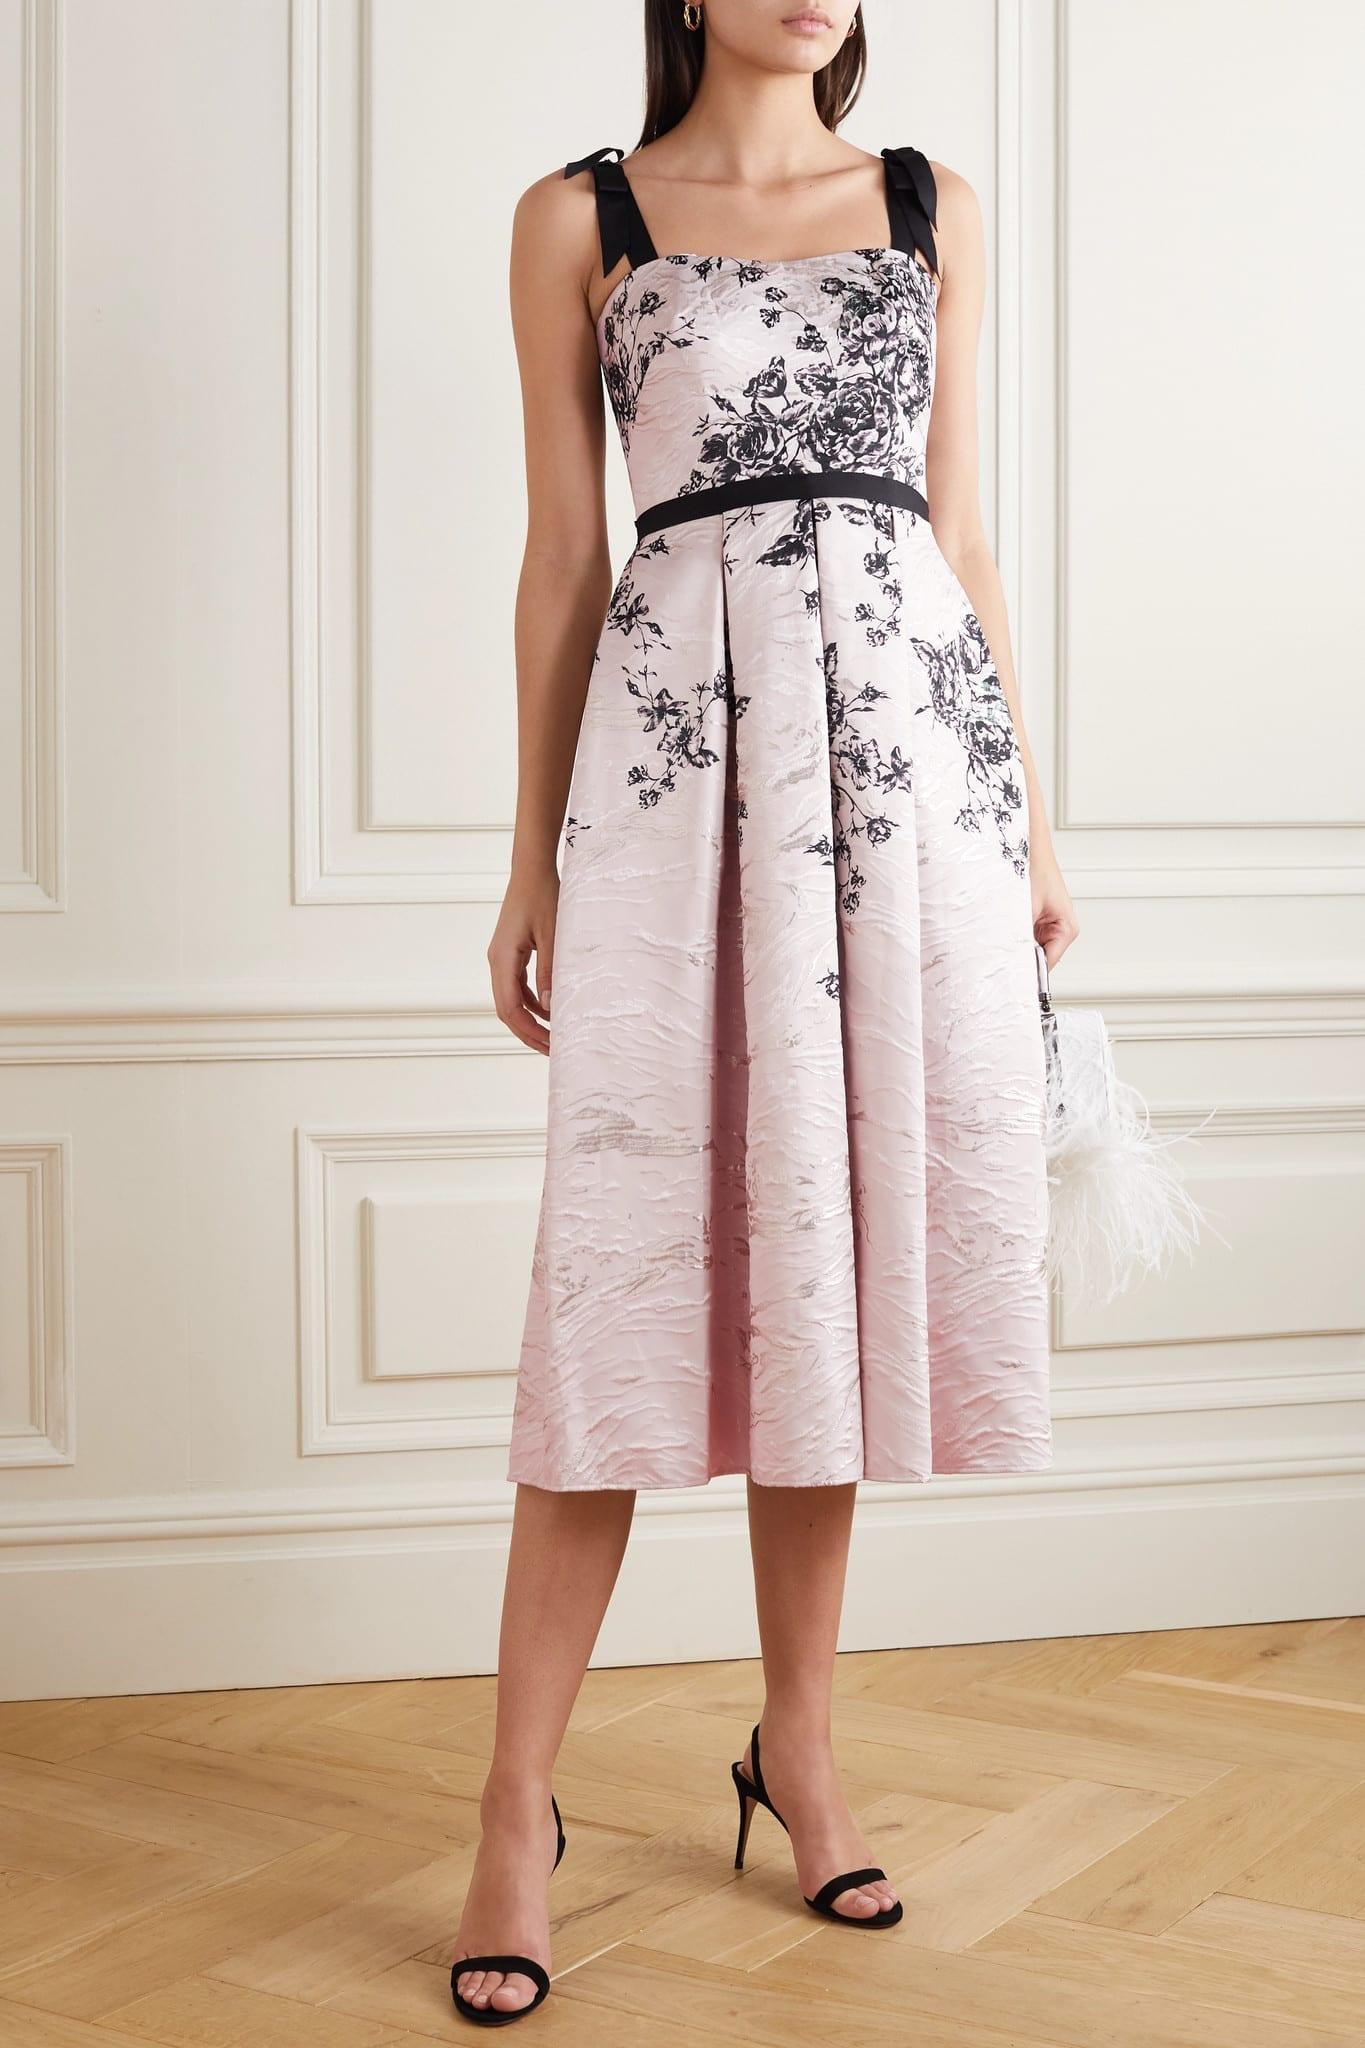 MARCHESA NOTTE Grosgrain-trimmed Metallic Floral-print Jacquard Midi Dress